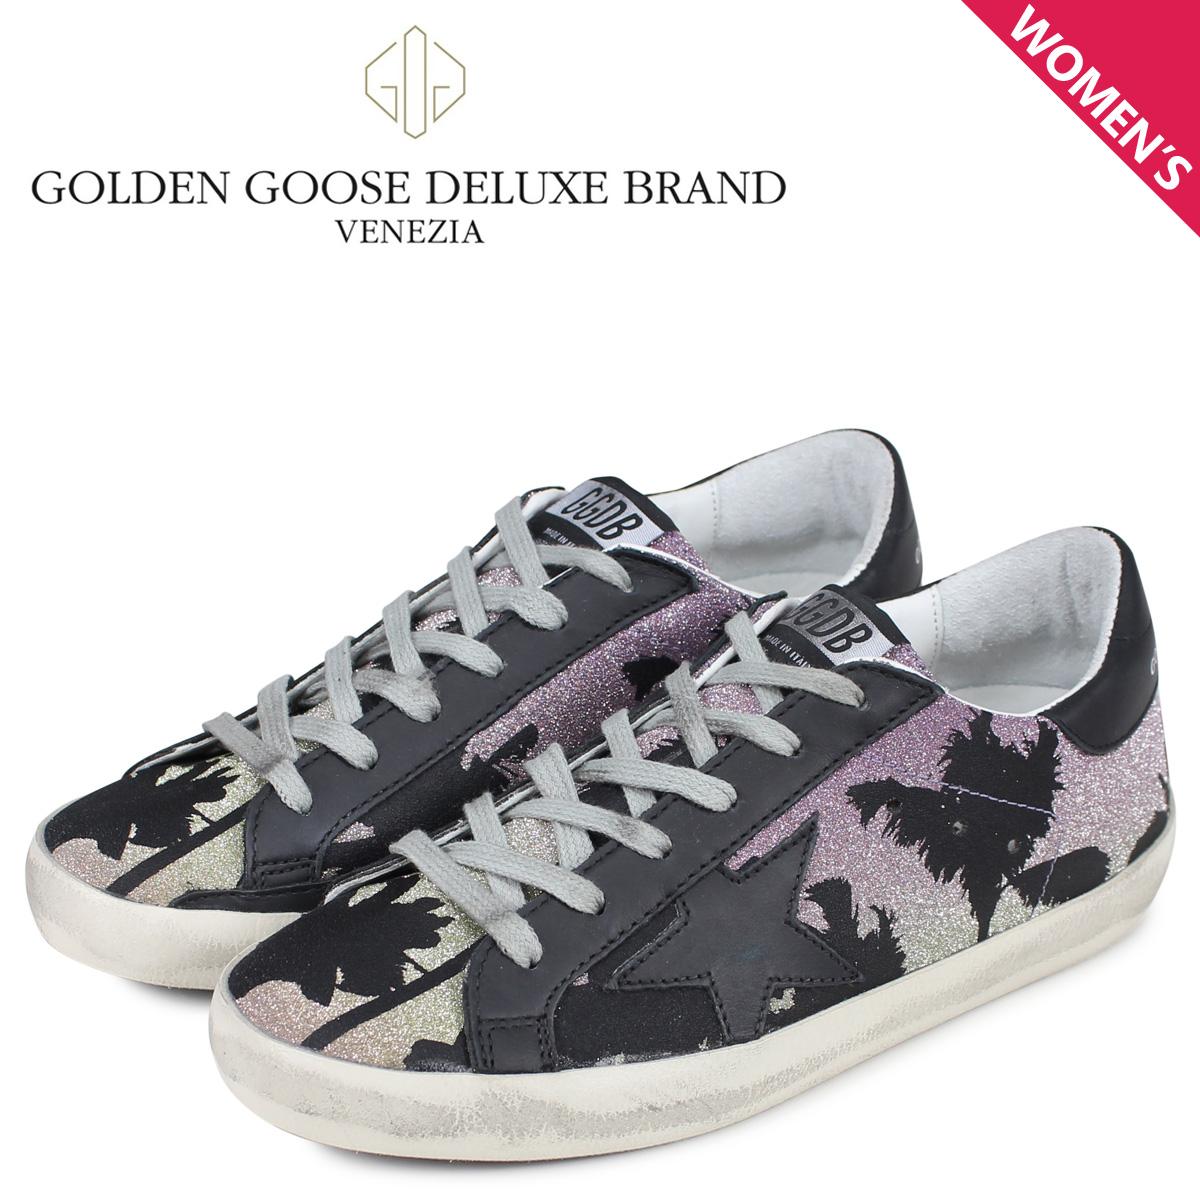 Golden Goose ゴールデングース スニーカー スーパースター レディース SNEAKERS SUPERSTAR ブラック 黒 G34WS590 M81